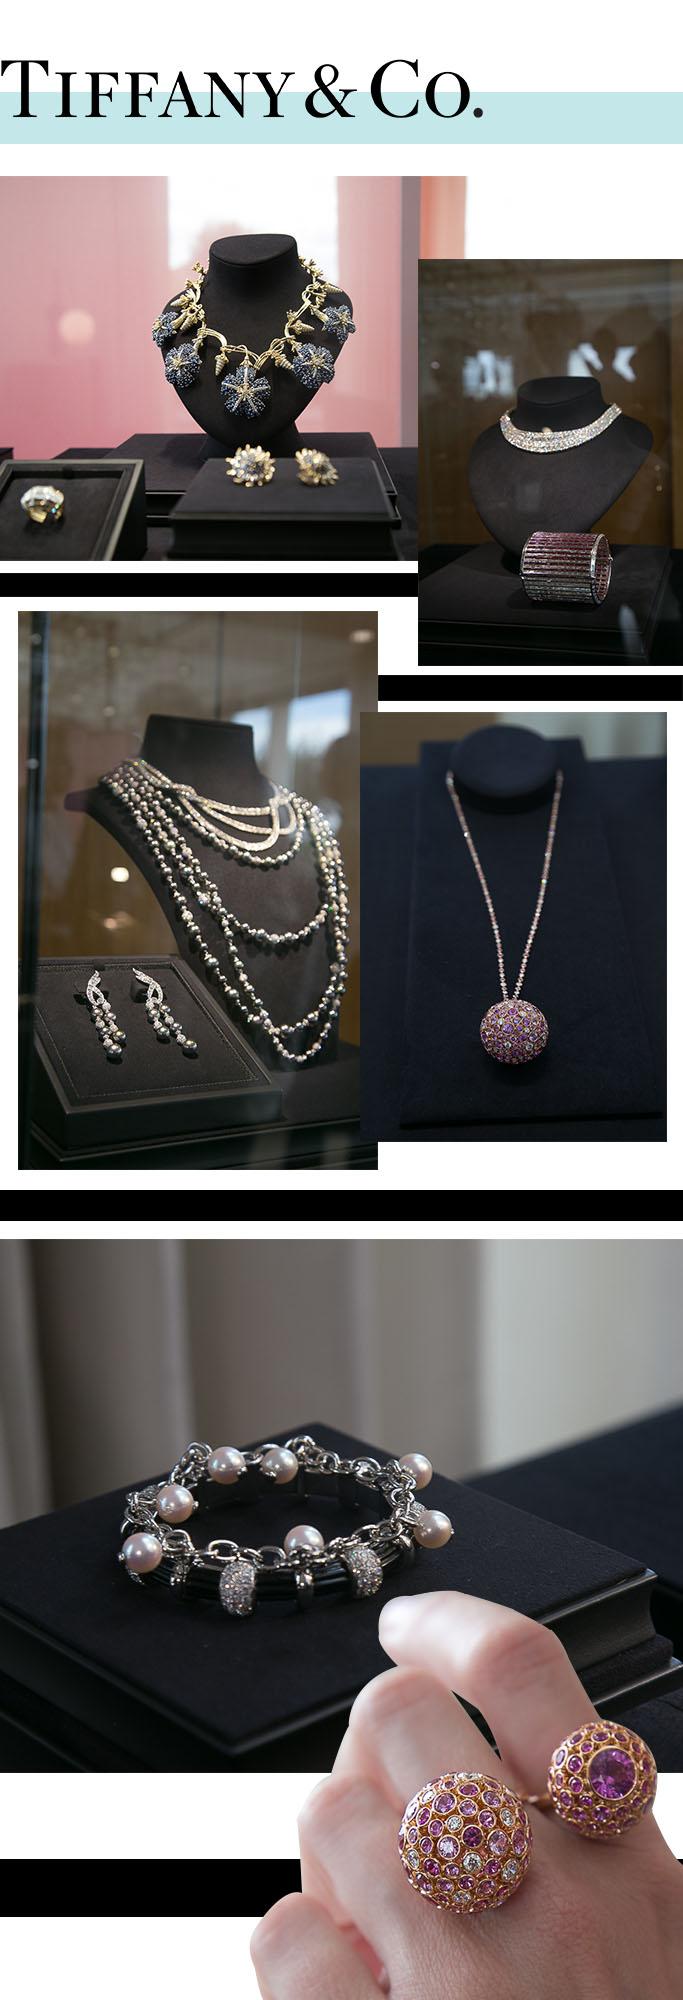 Lifestyle - Paris me Chama Por Paula Rita Saady - Alta Joalheria Tiffanys 1 - Blog Paula Martins